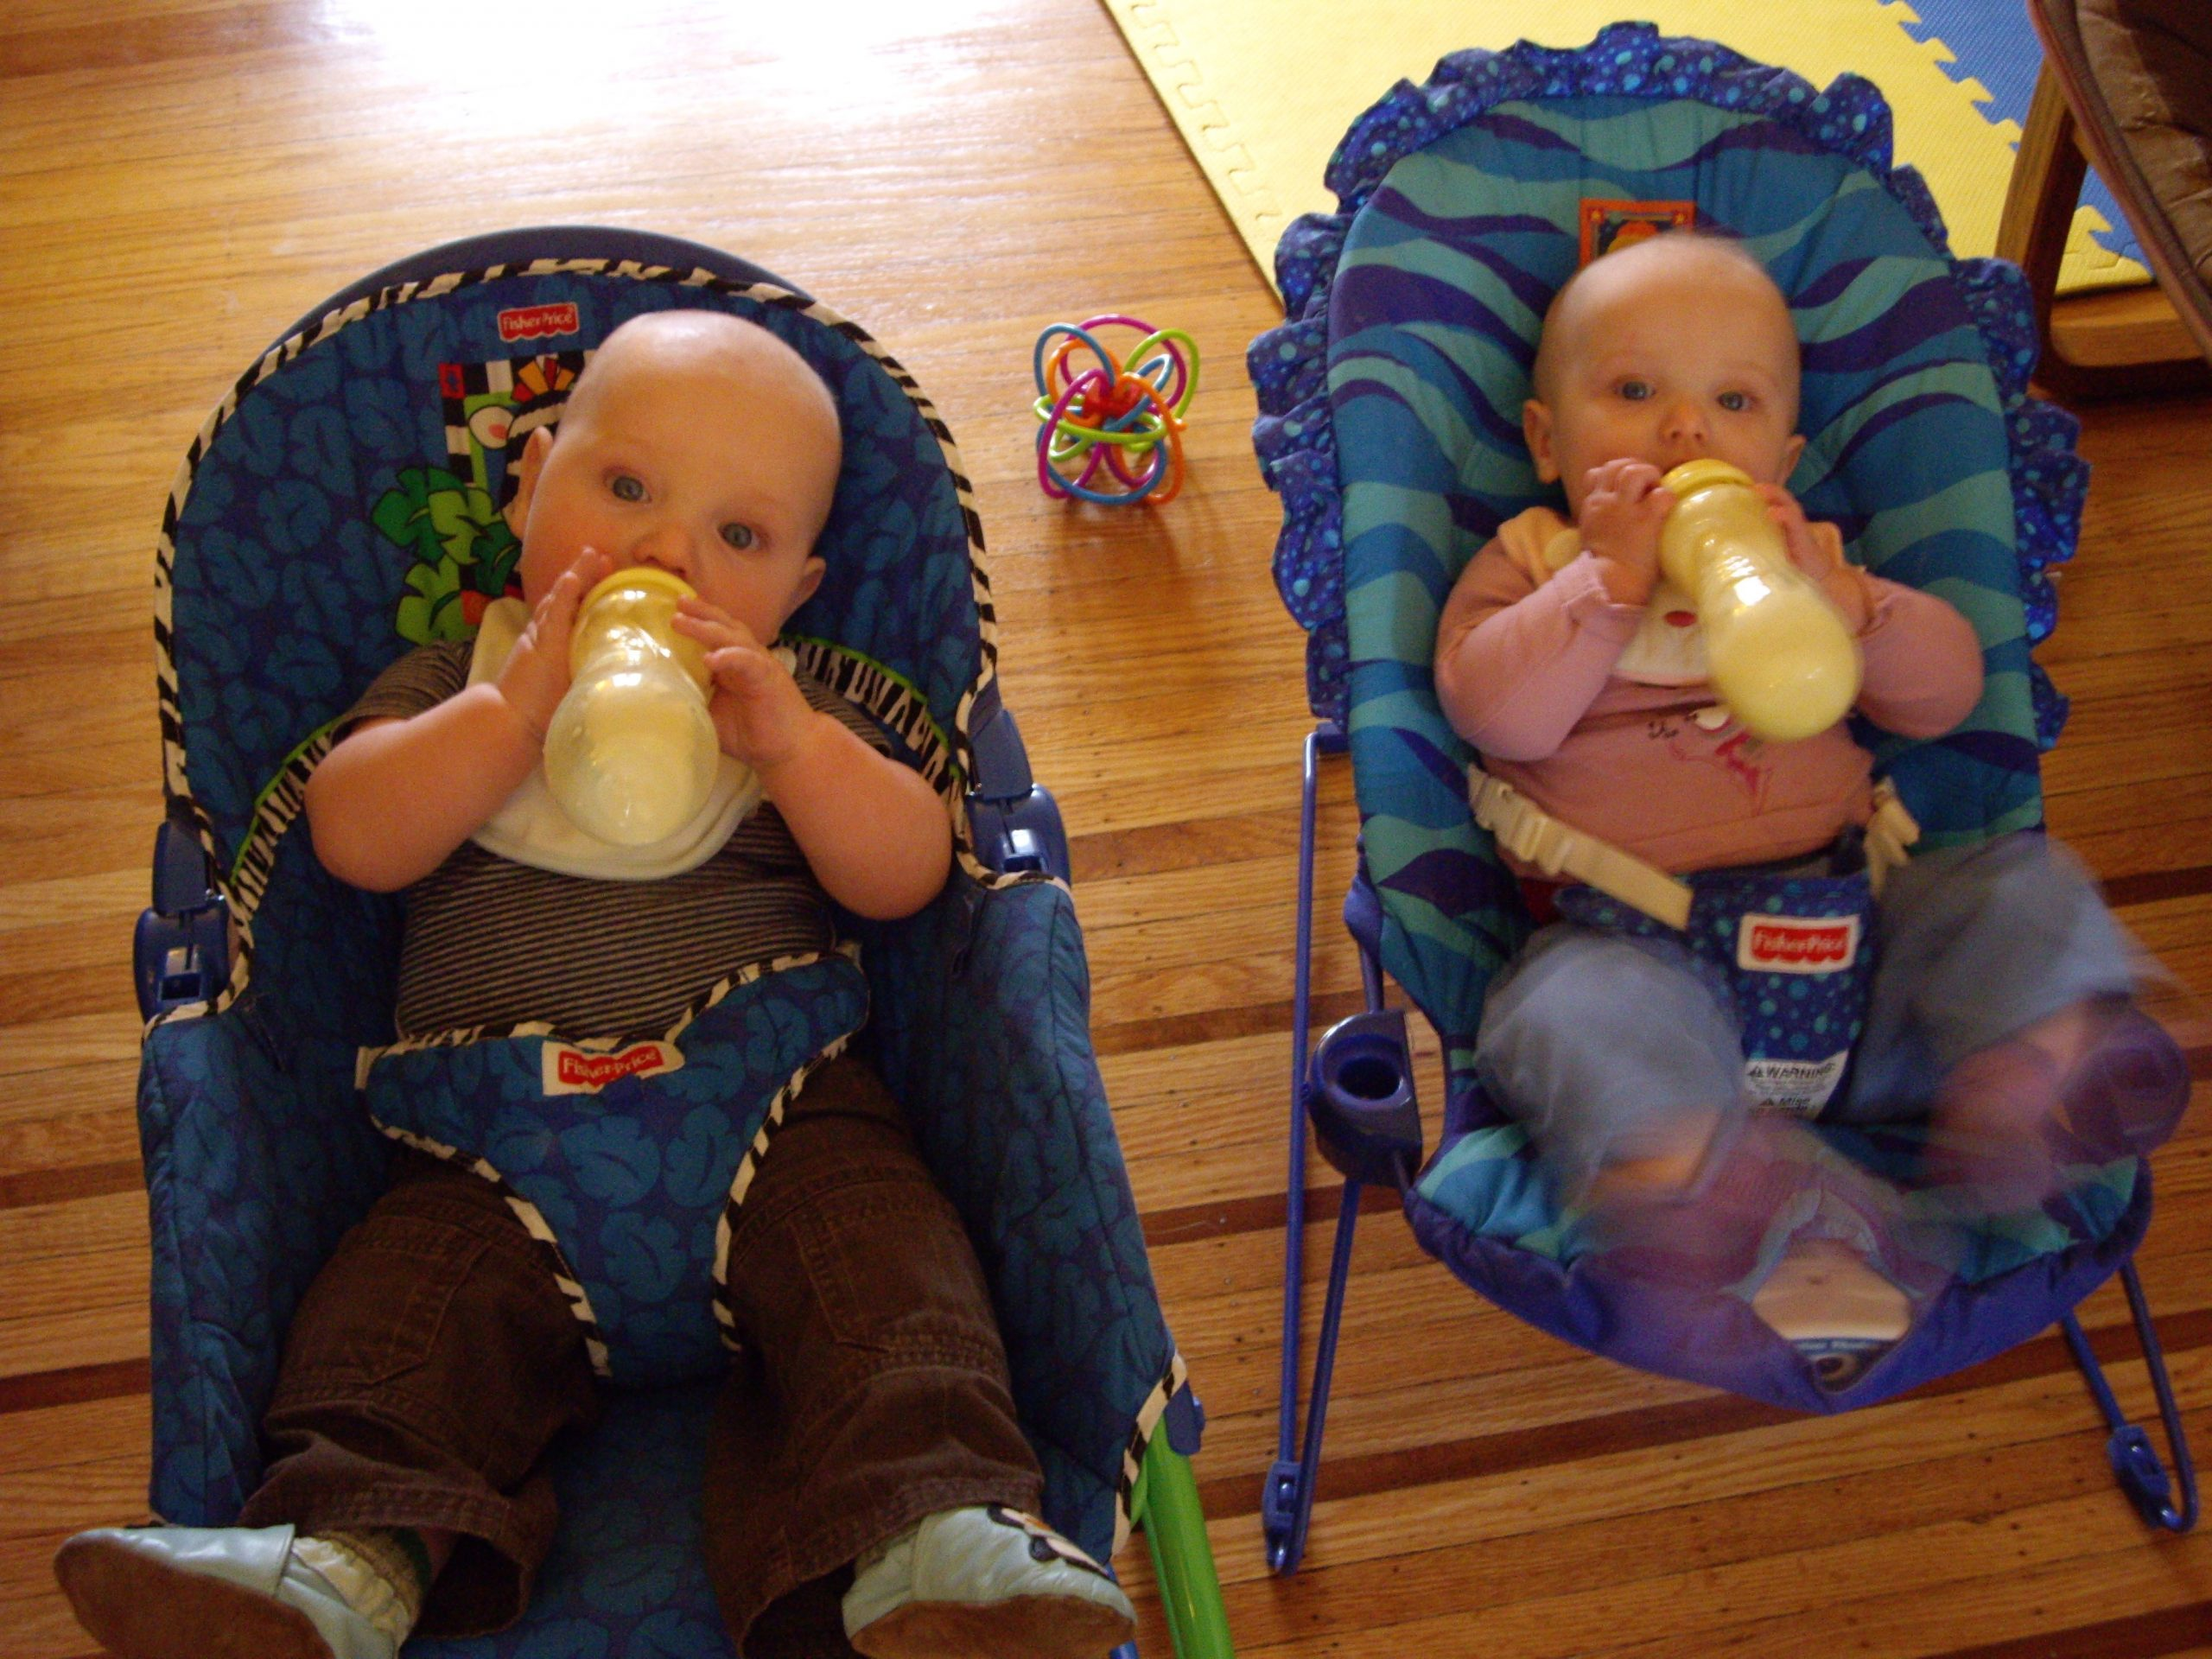 Babies drinking from milk bottles